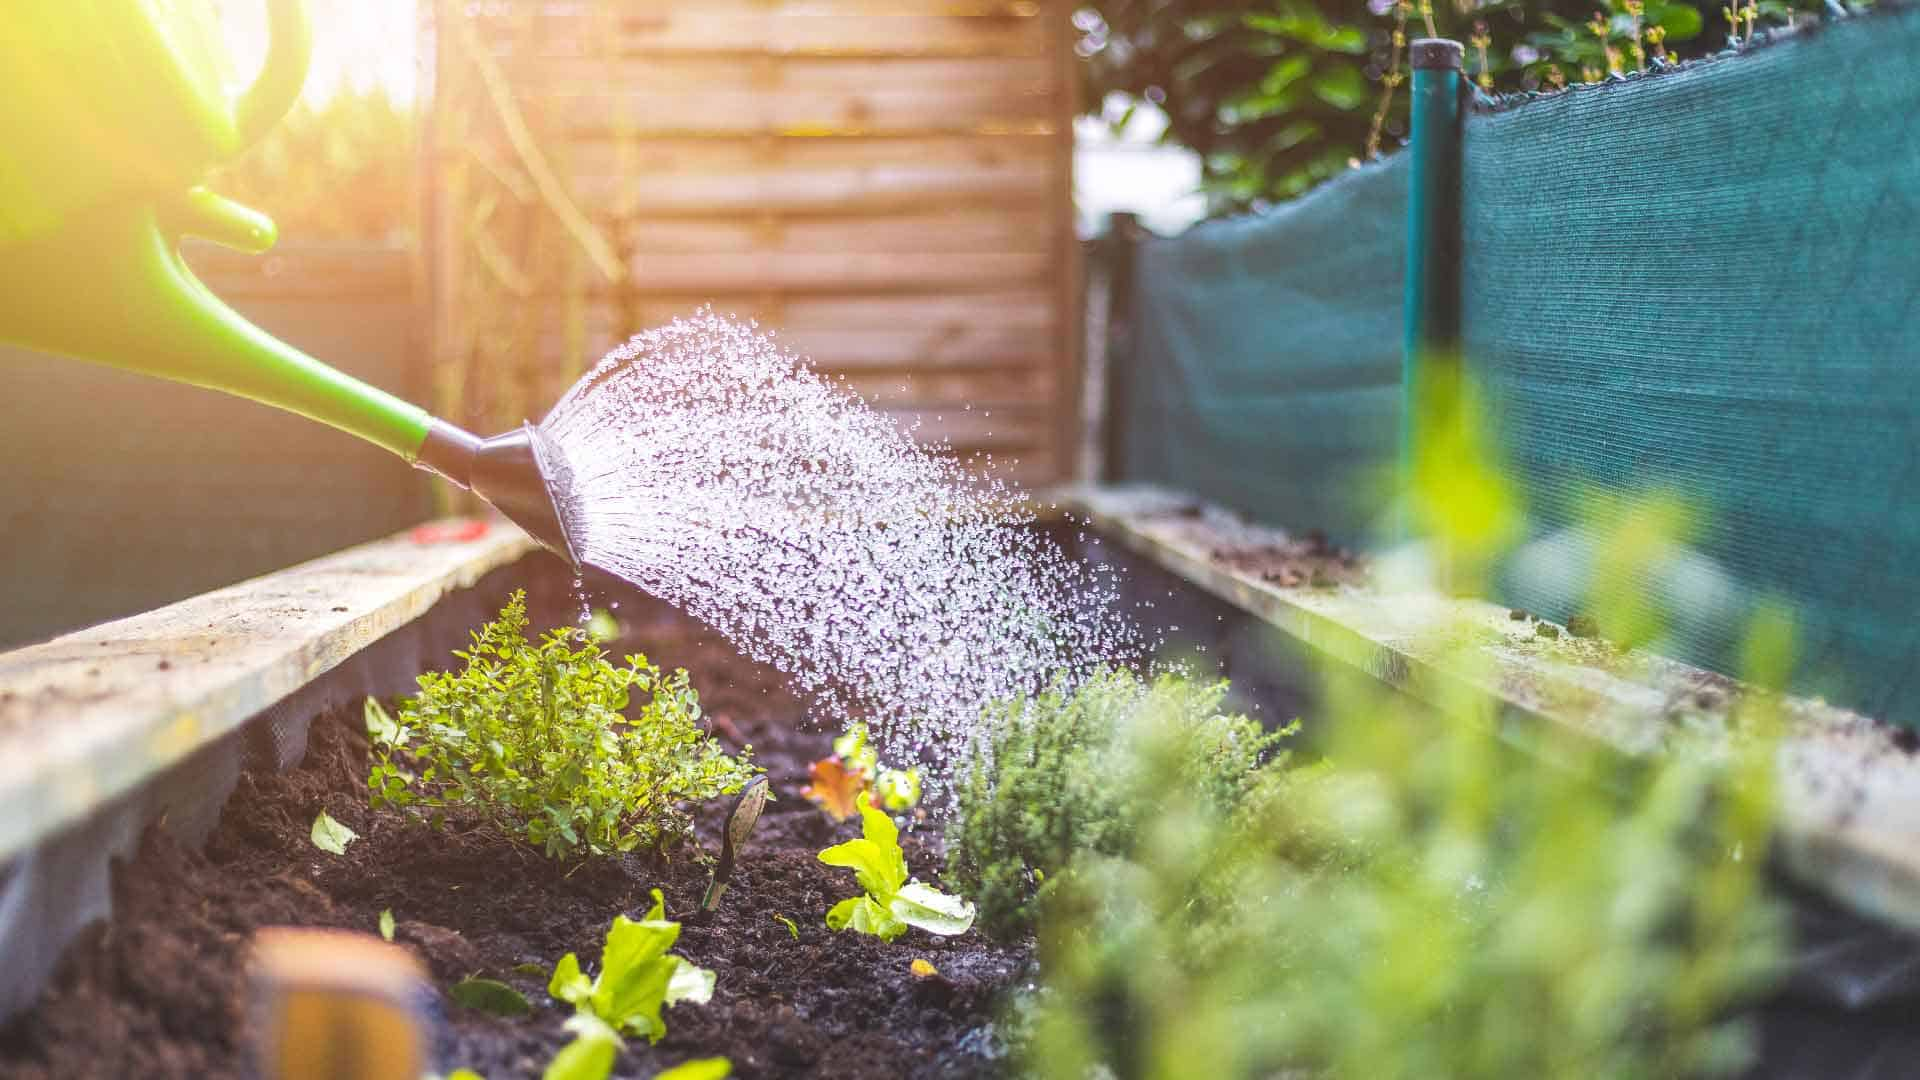 Watering raised bed vegetable garden.